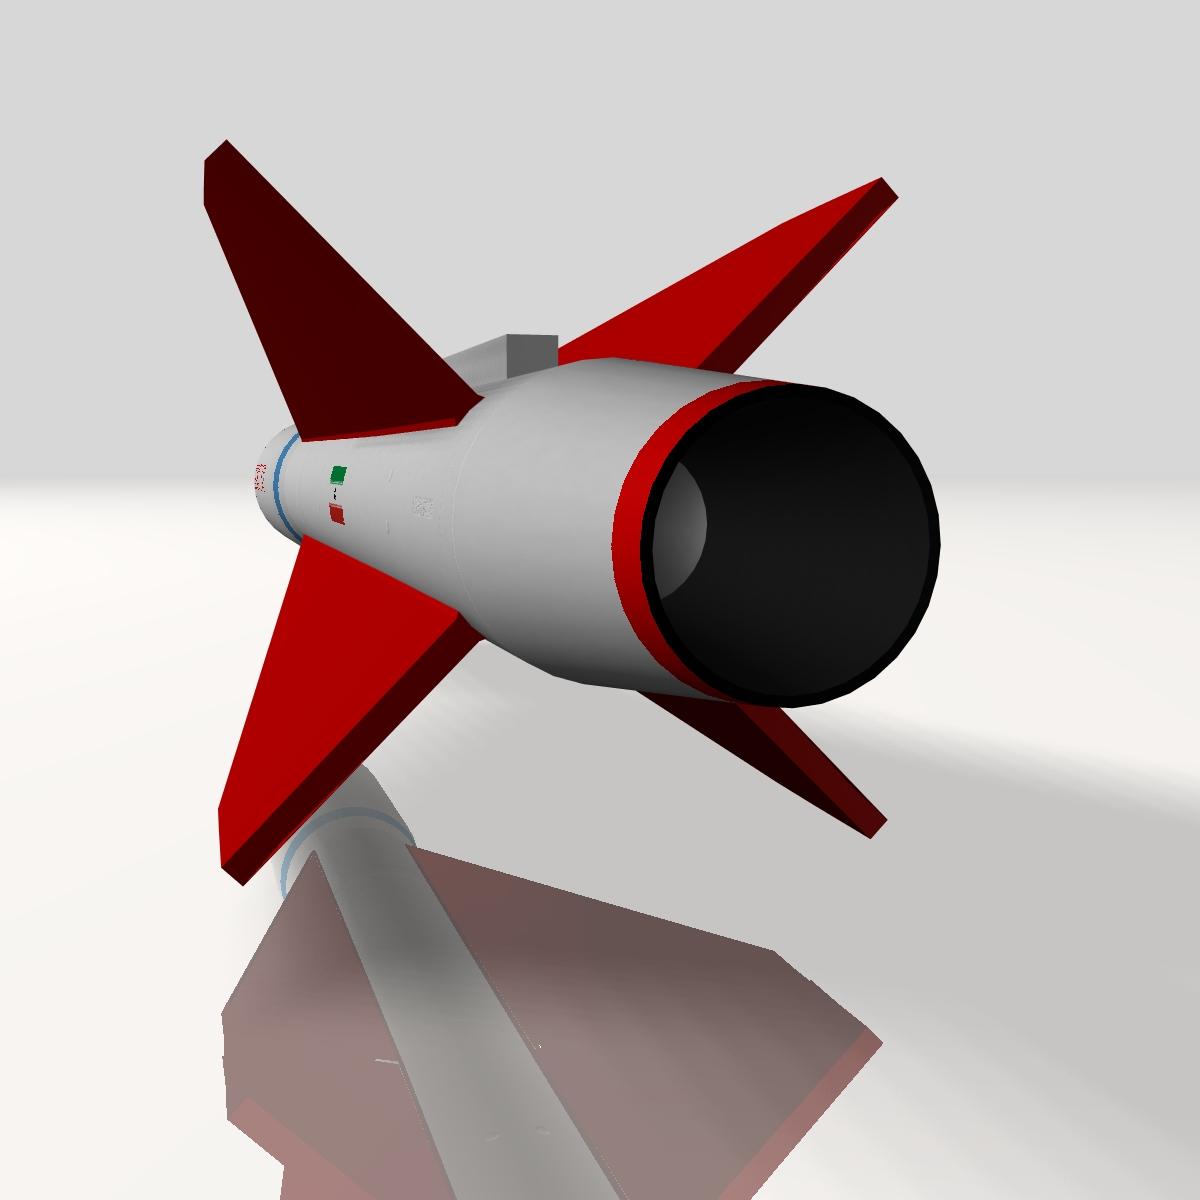 iran yasser asm raketi 3d modeli 3ds dxf cob x obj 150565